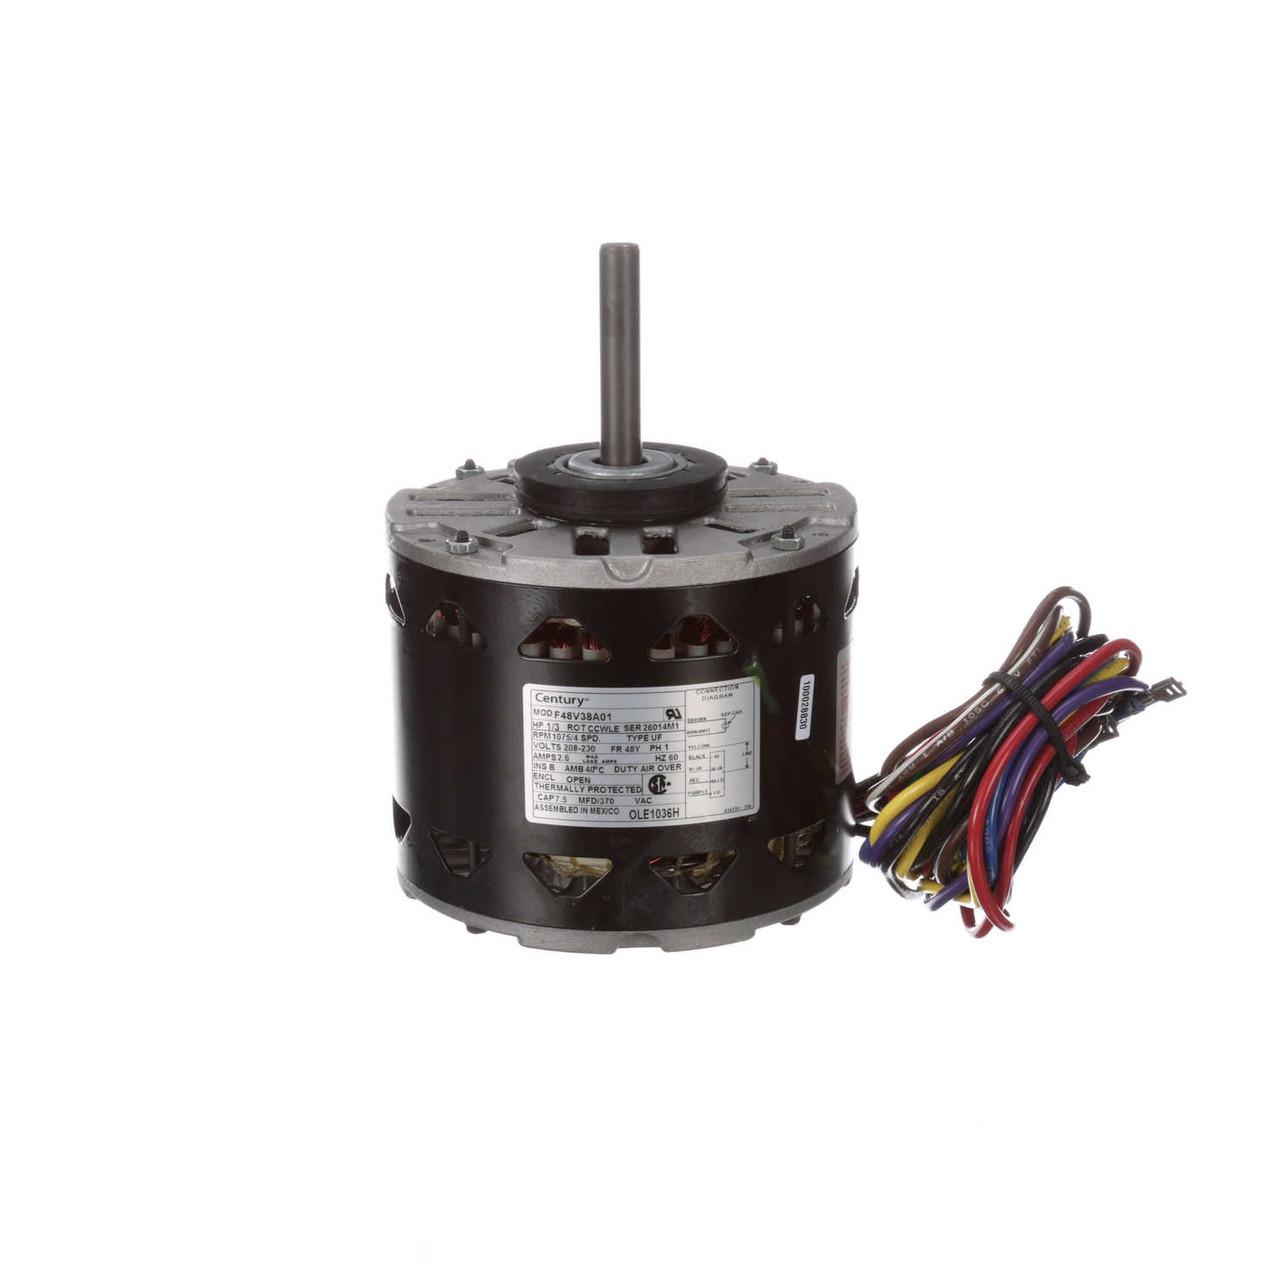 medium resolution of lennox furnace motor p 8 8609 1 3 hp 1075 rpm 208 230v century ole1036h